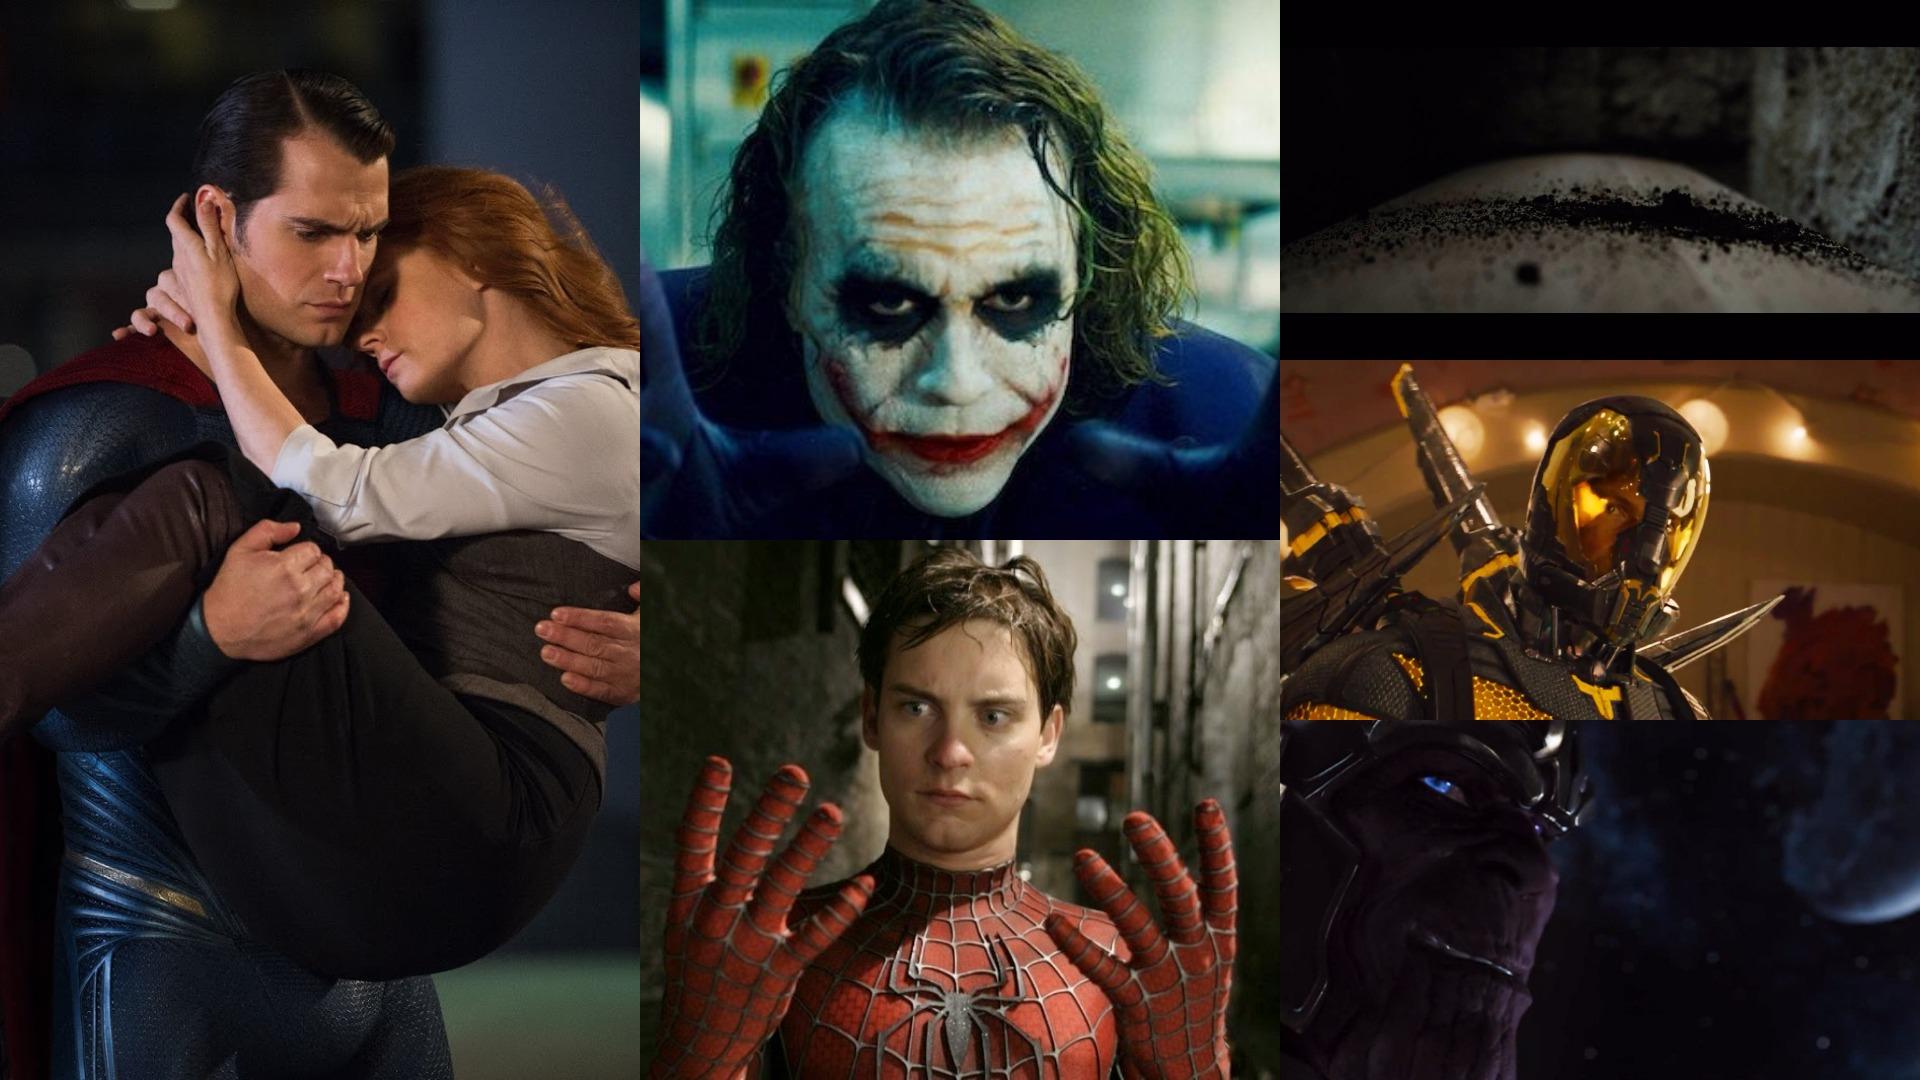 Superhero Movie Tropes that Need to Go Away